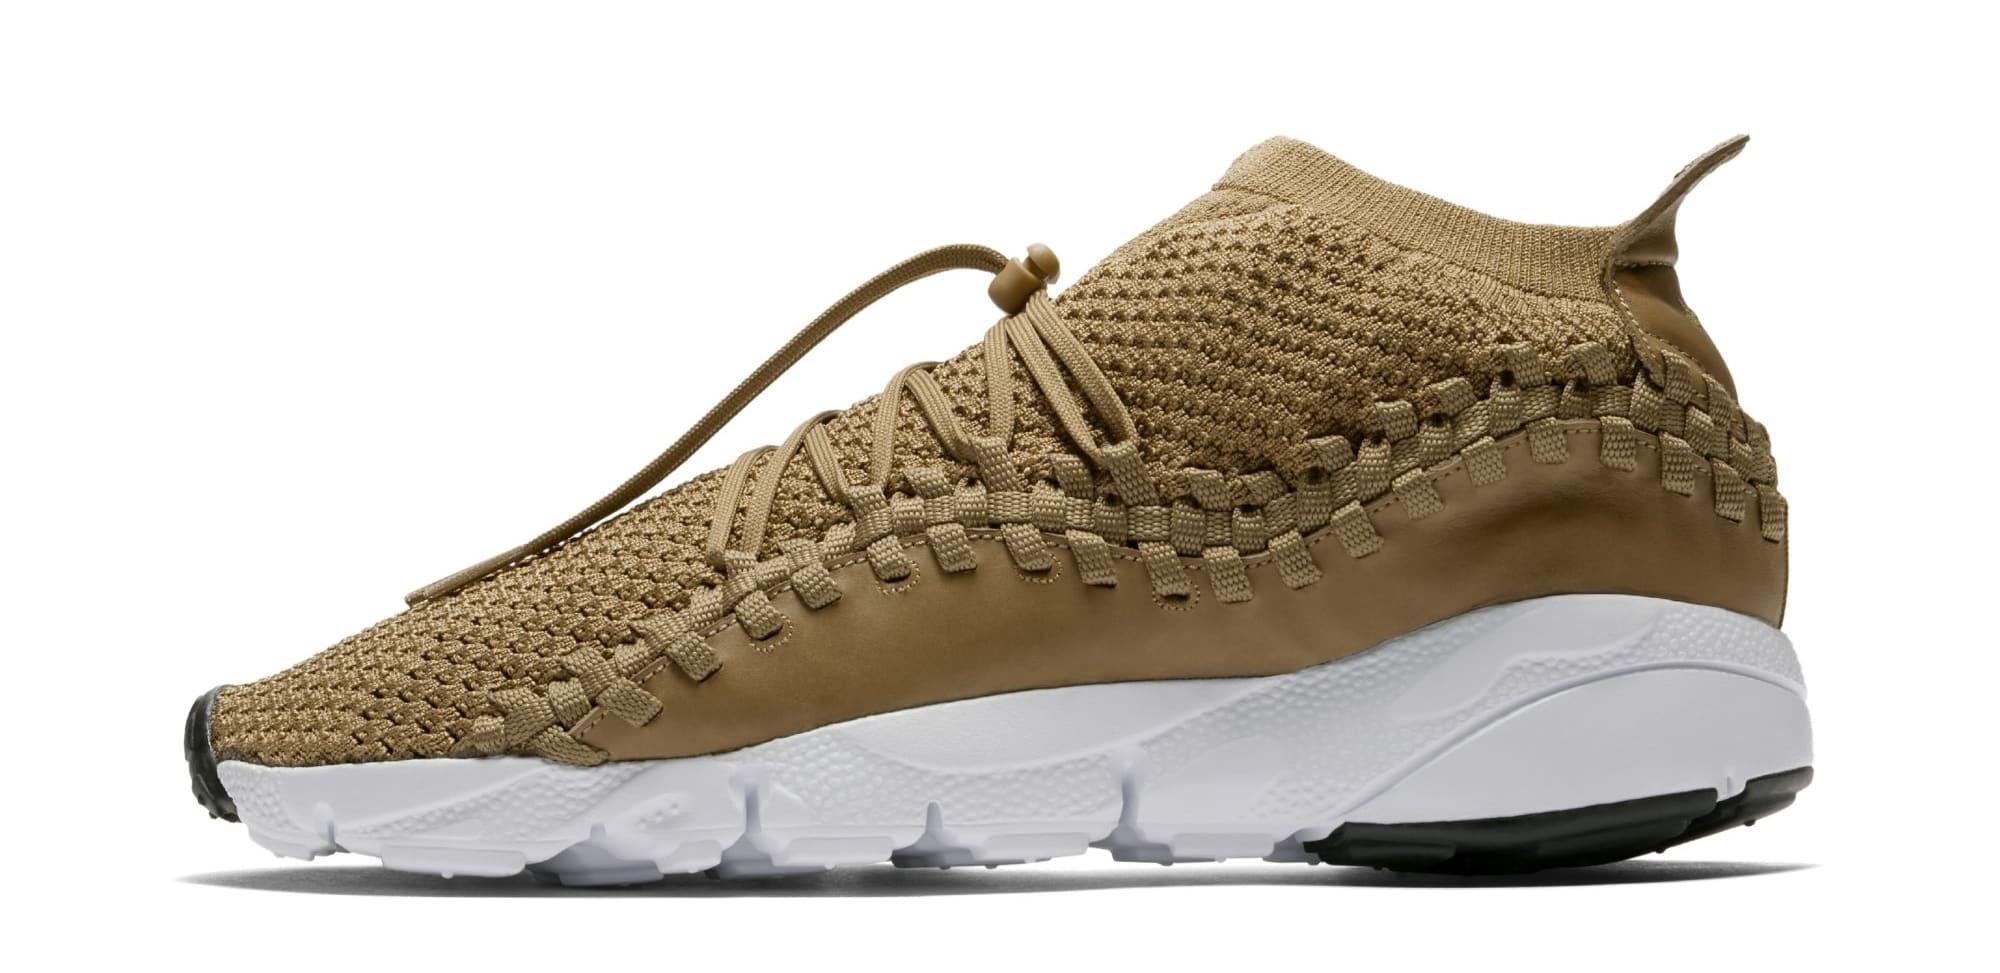 Nike Footscape Woven Chukka Flyknit 'Golden Beige' AO5417-400 (Lateral)